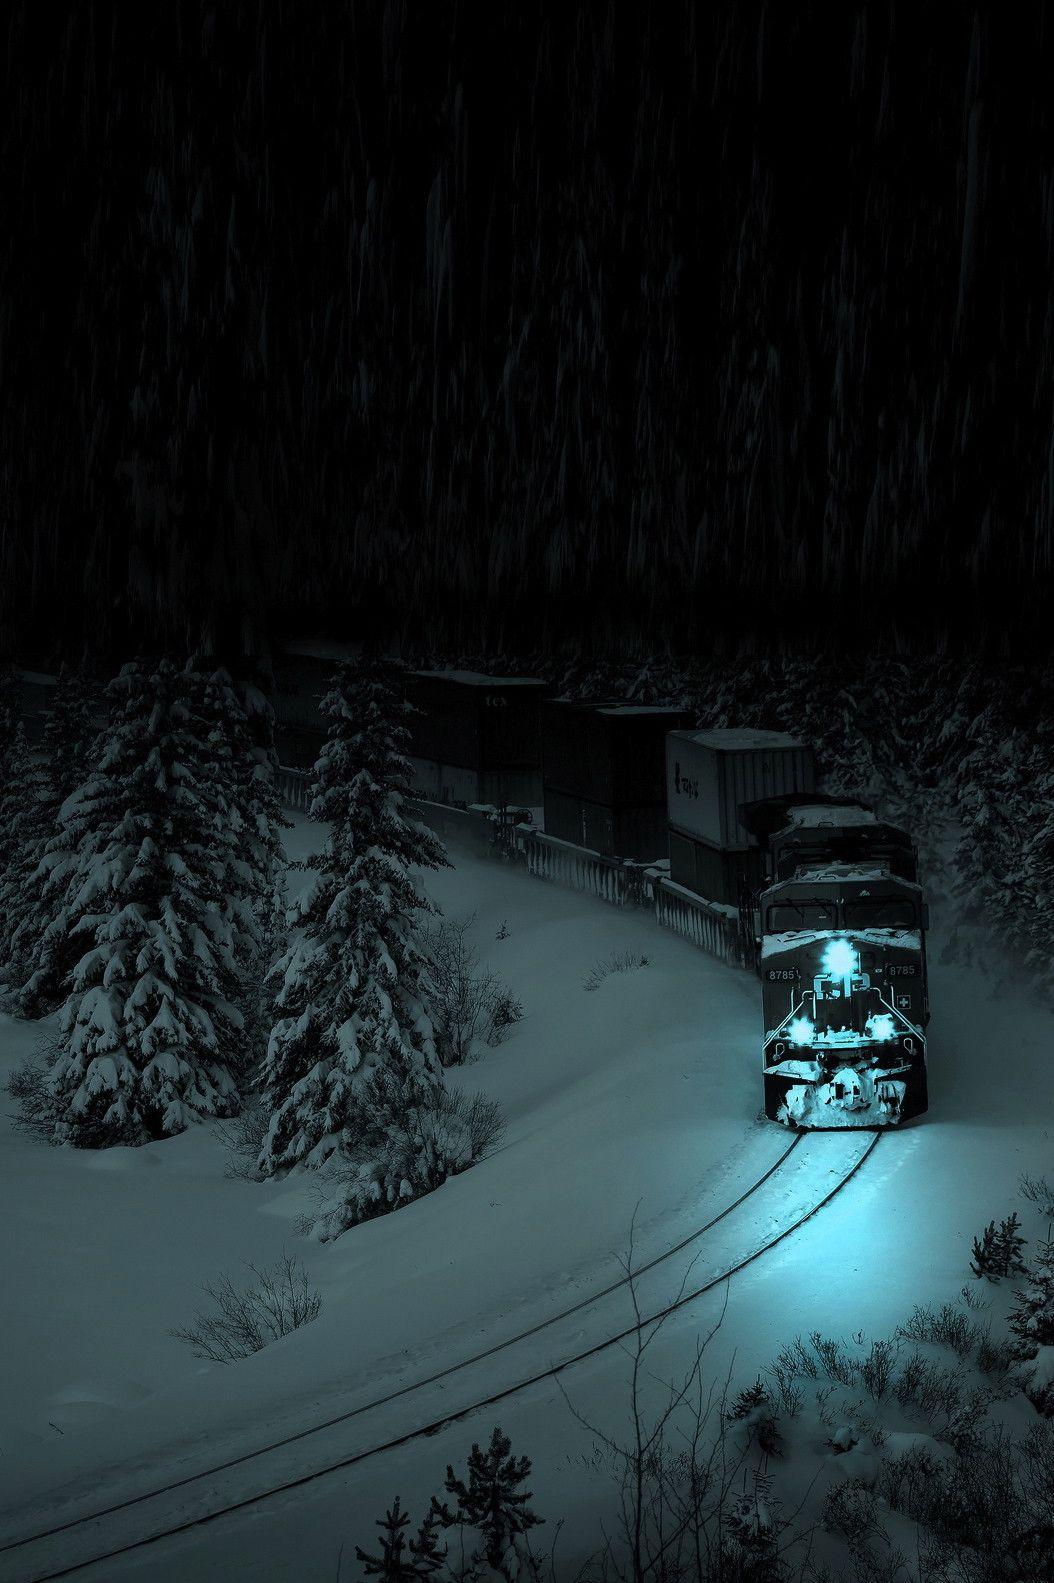 Cool Train Picture Night Train Train Pictures Train Tracks Hd wallpaper winter snow train forest